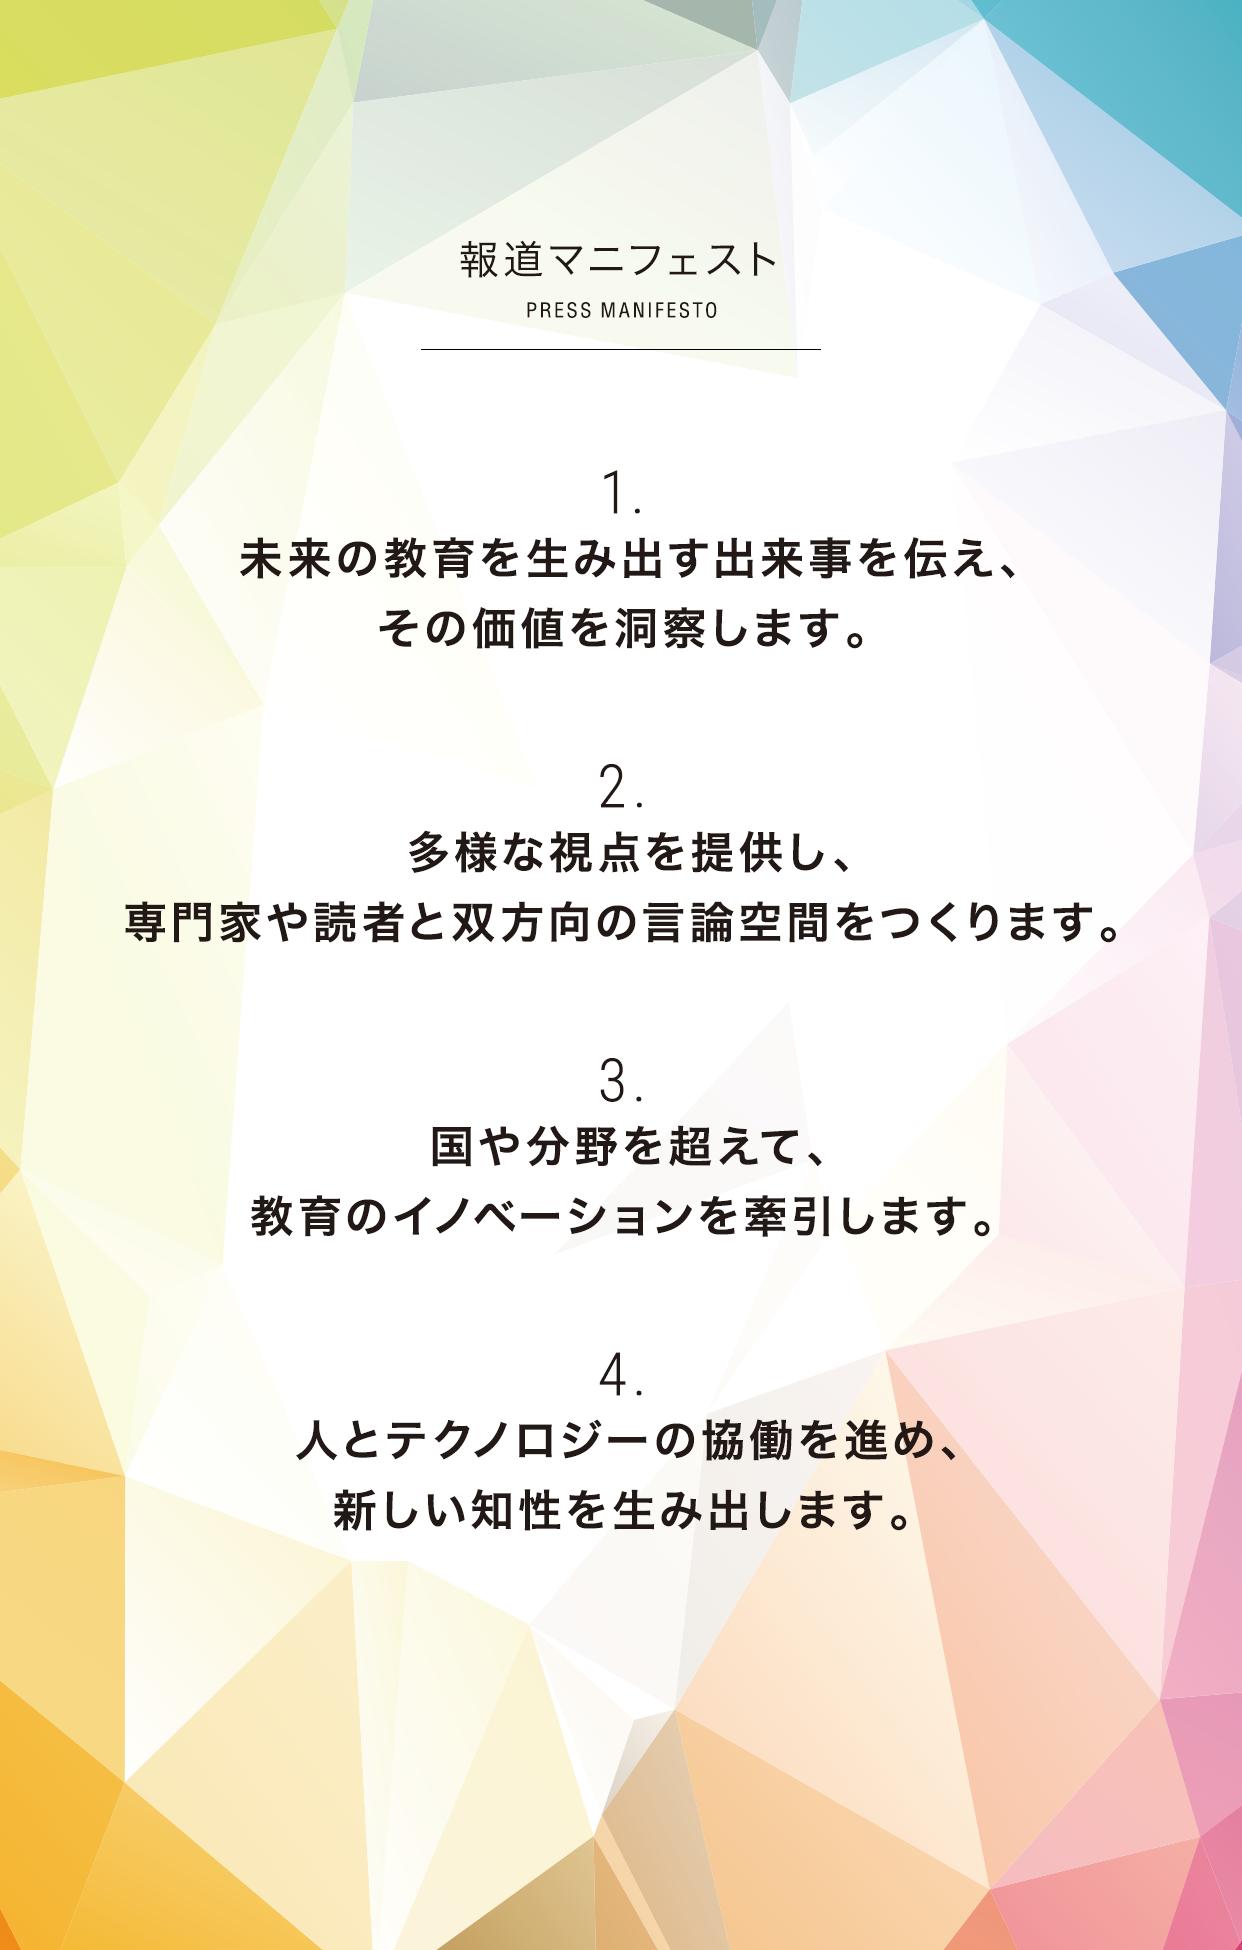 Press_Manifesto_smp